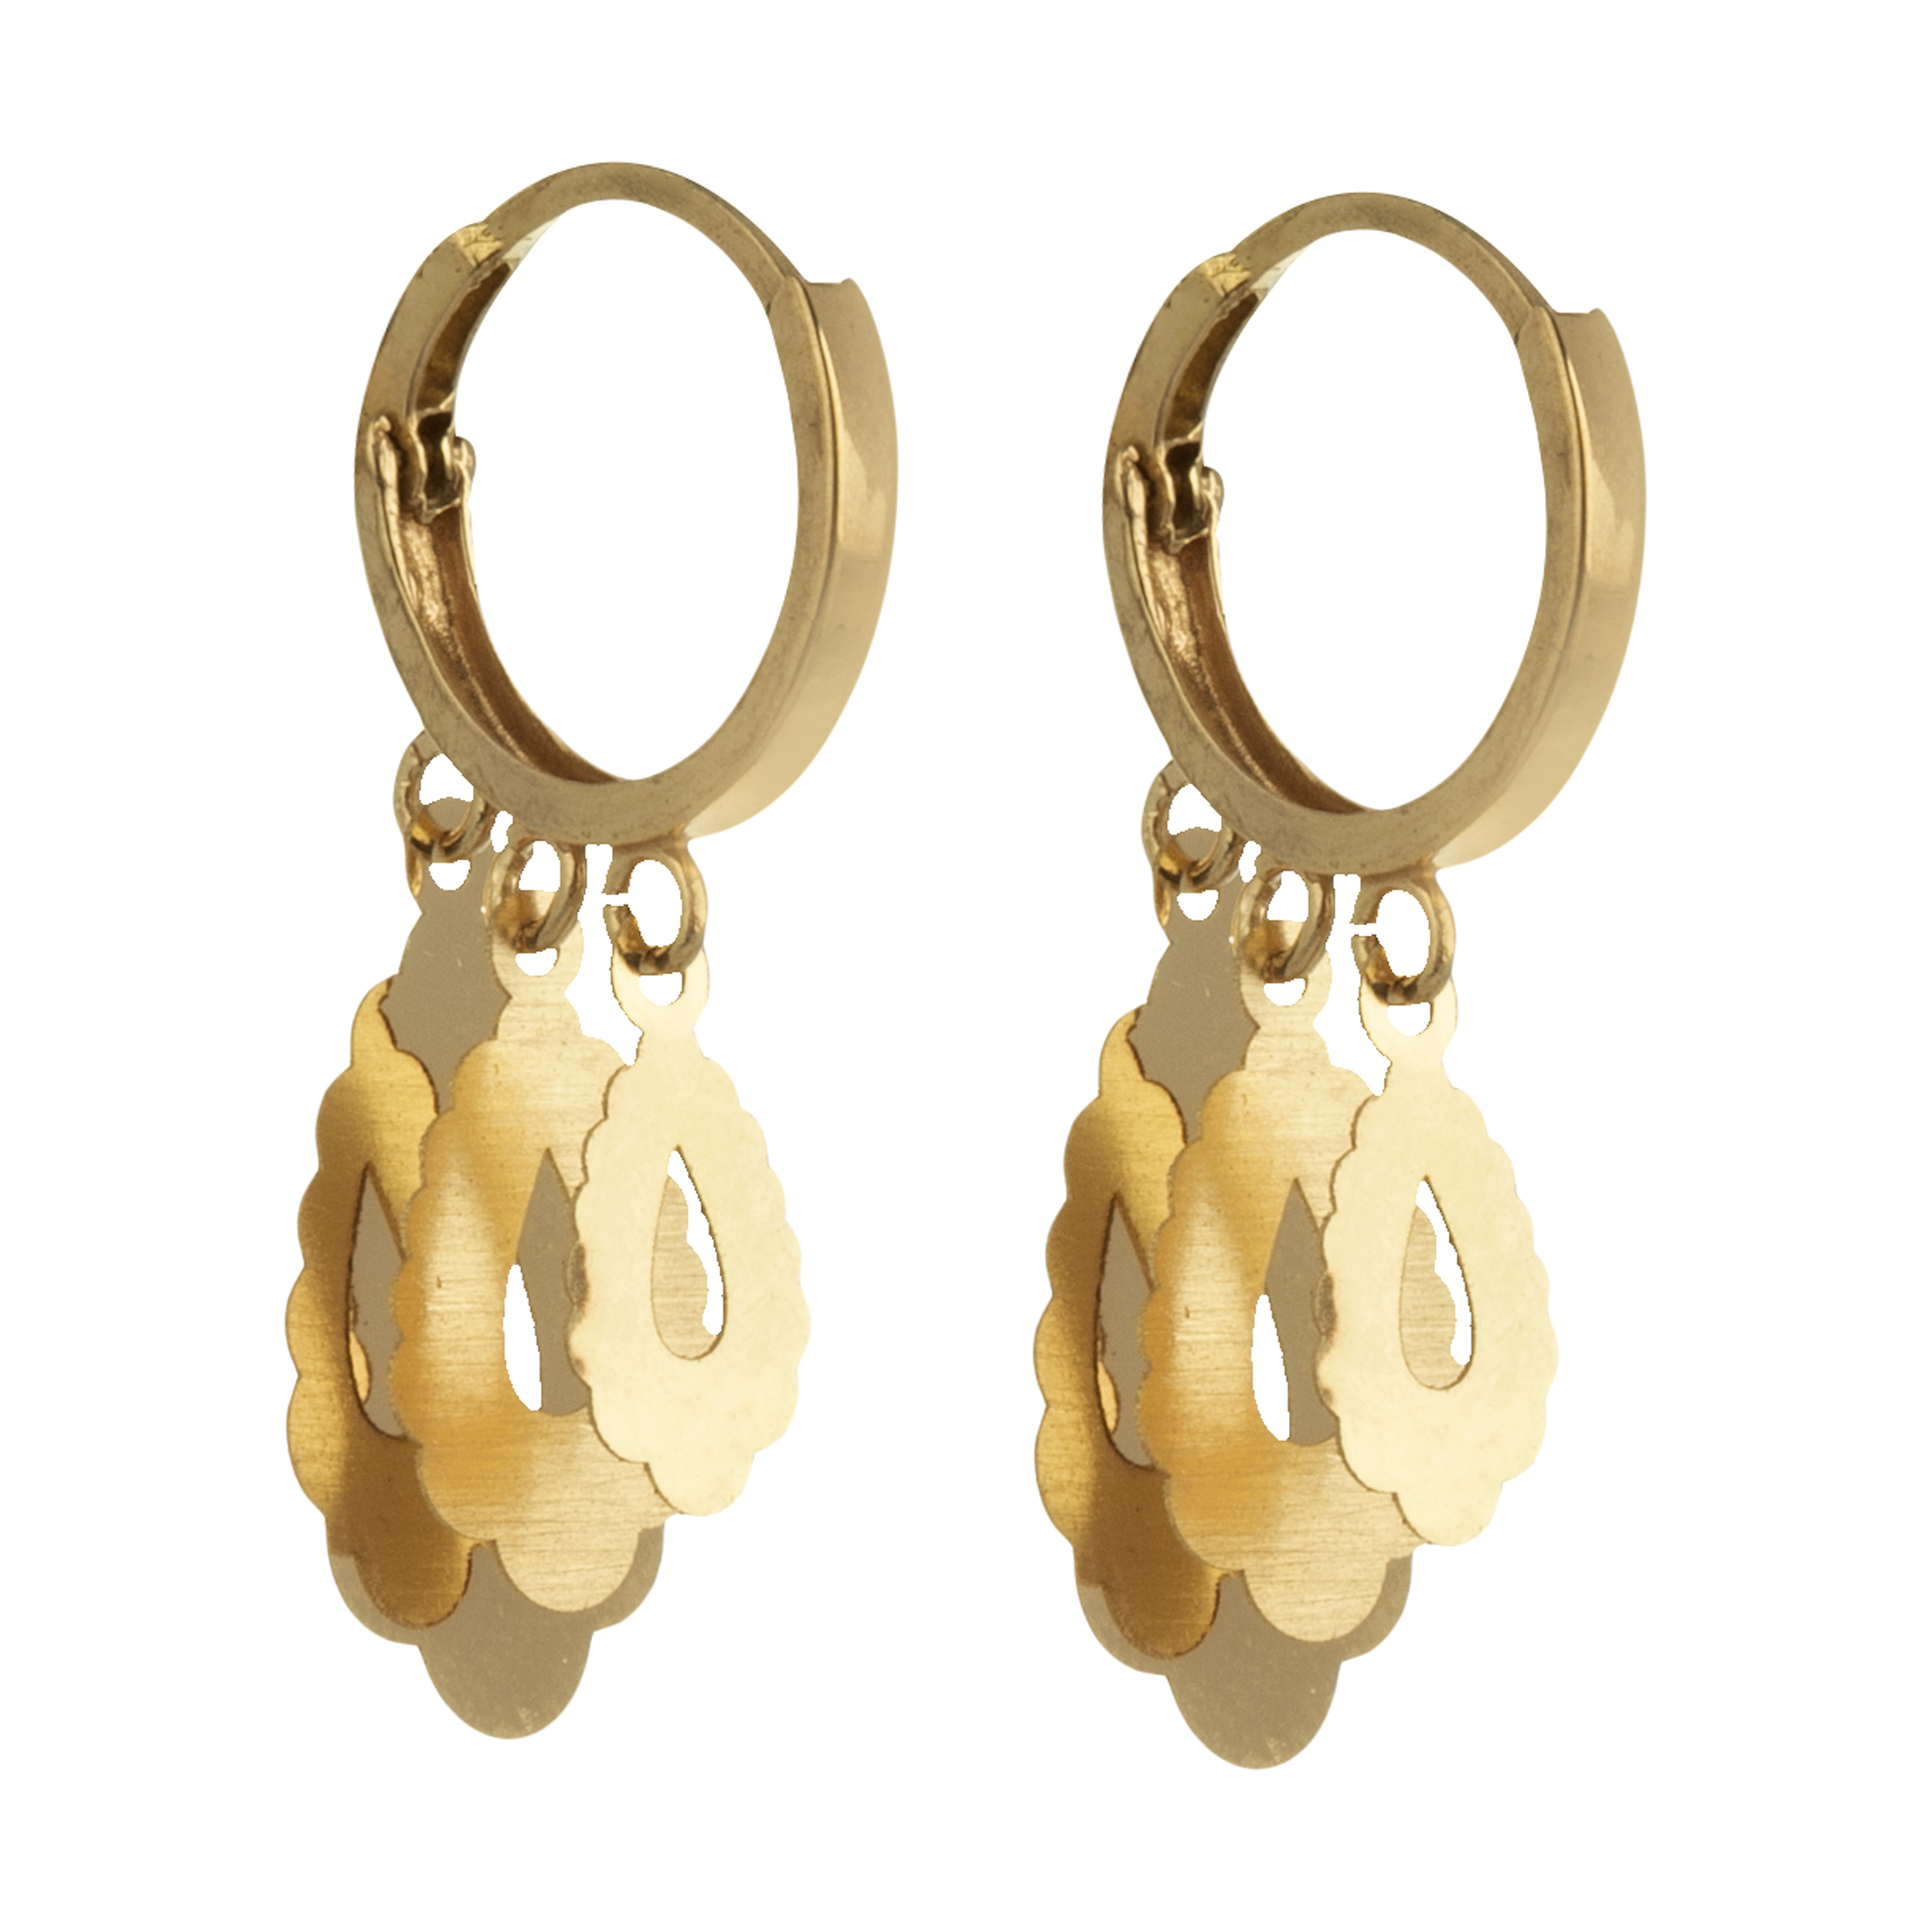 گوشواره طلا 18 عیار زنانه  گالری یارطلا کد AG27-1